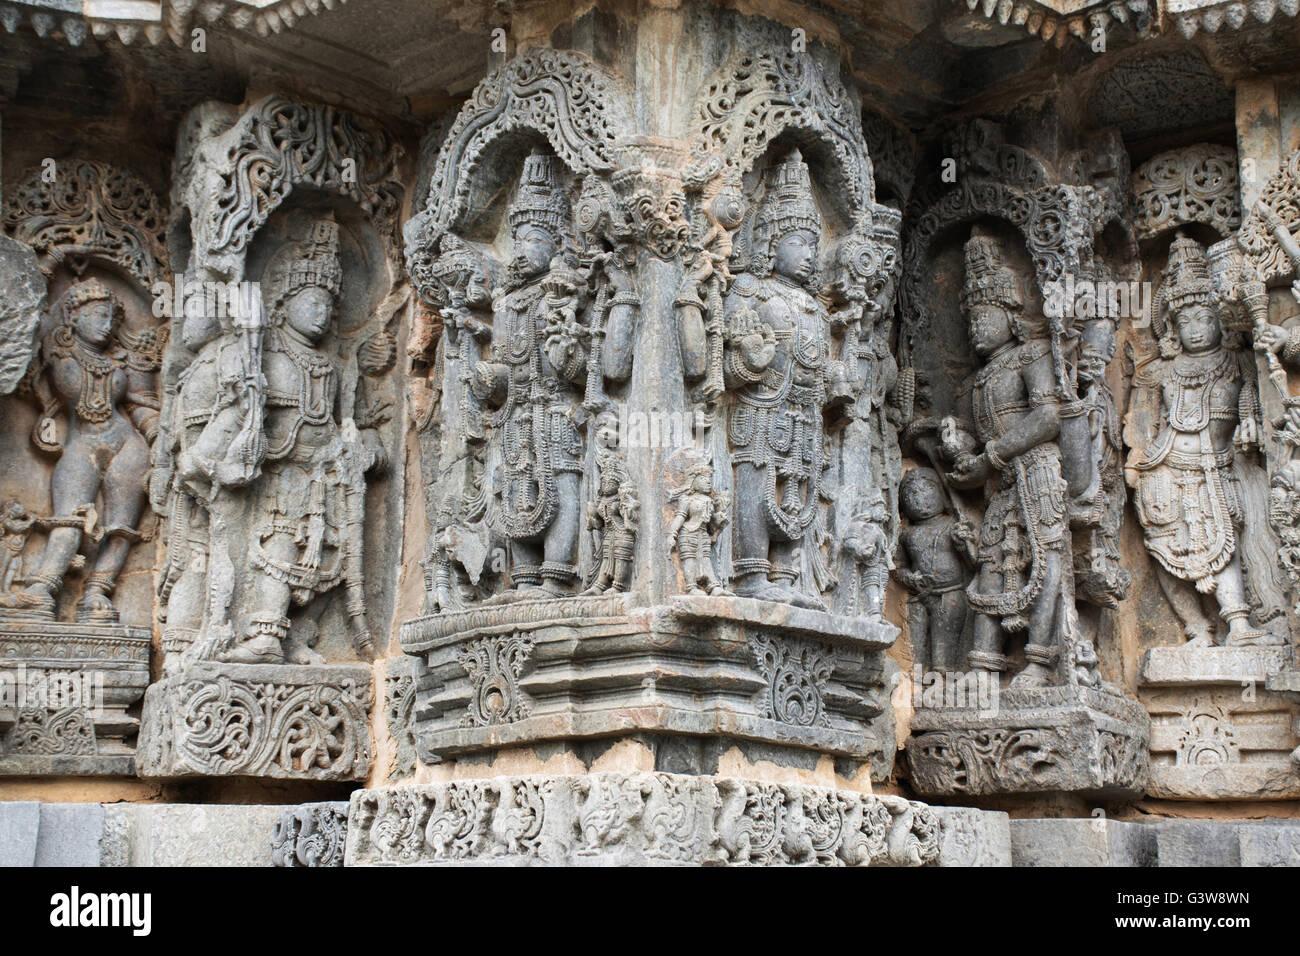 Ornate bas relieif and sculptures of Hindu deities, Kedareshwara Temple, Halebid, Karnataka, india. - Stock Image